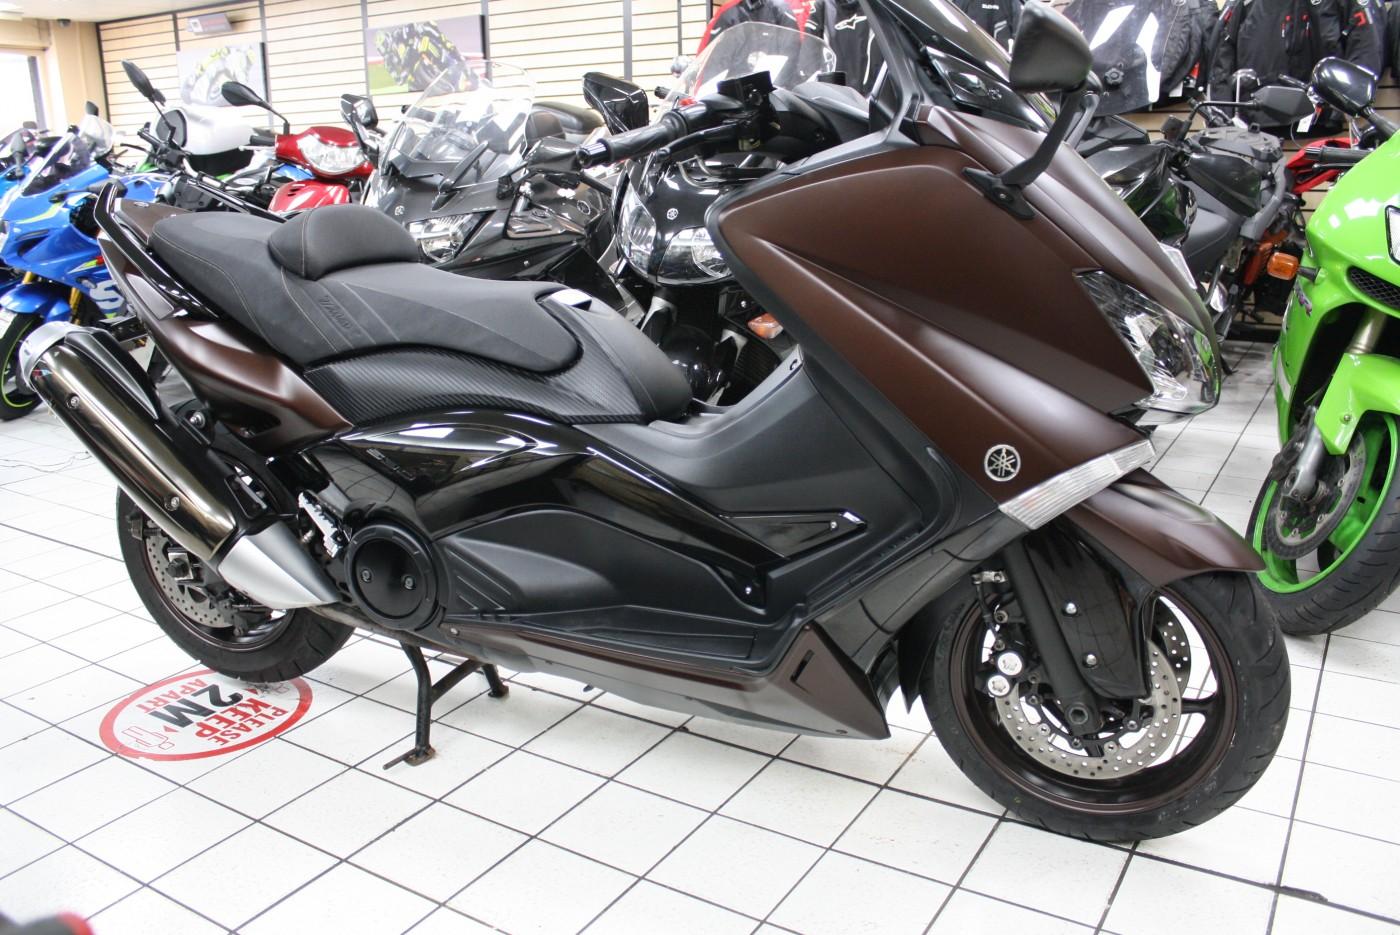 Yamaha Tmax 530 LTD Edition